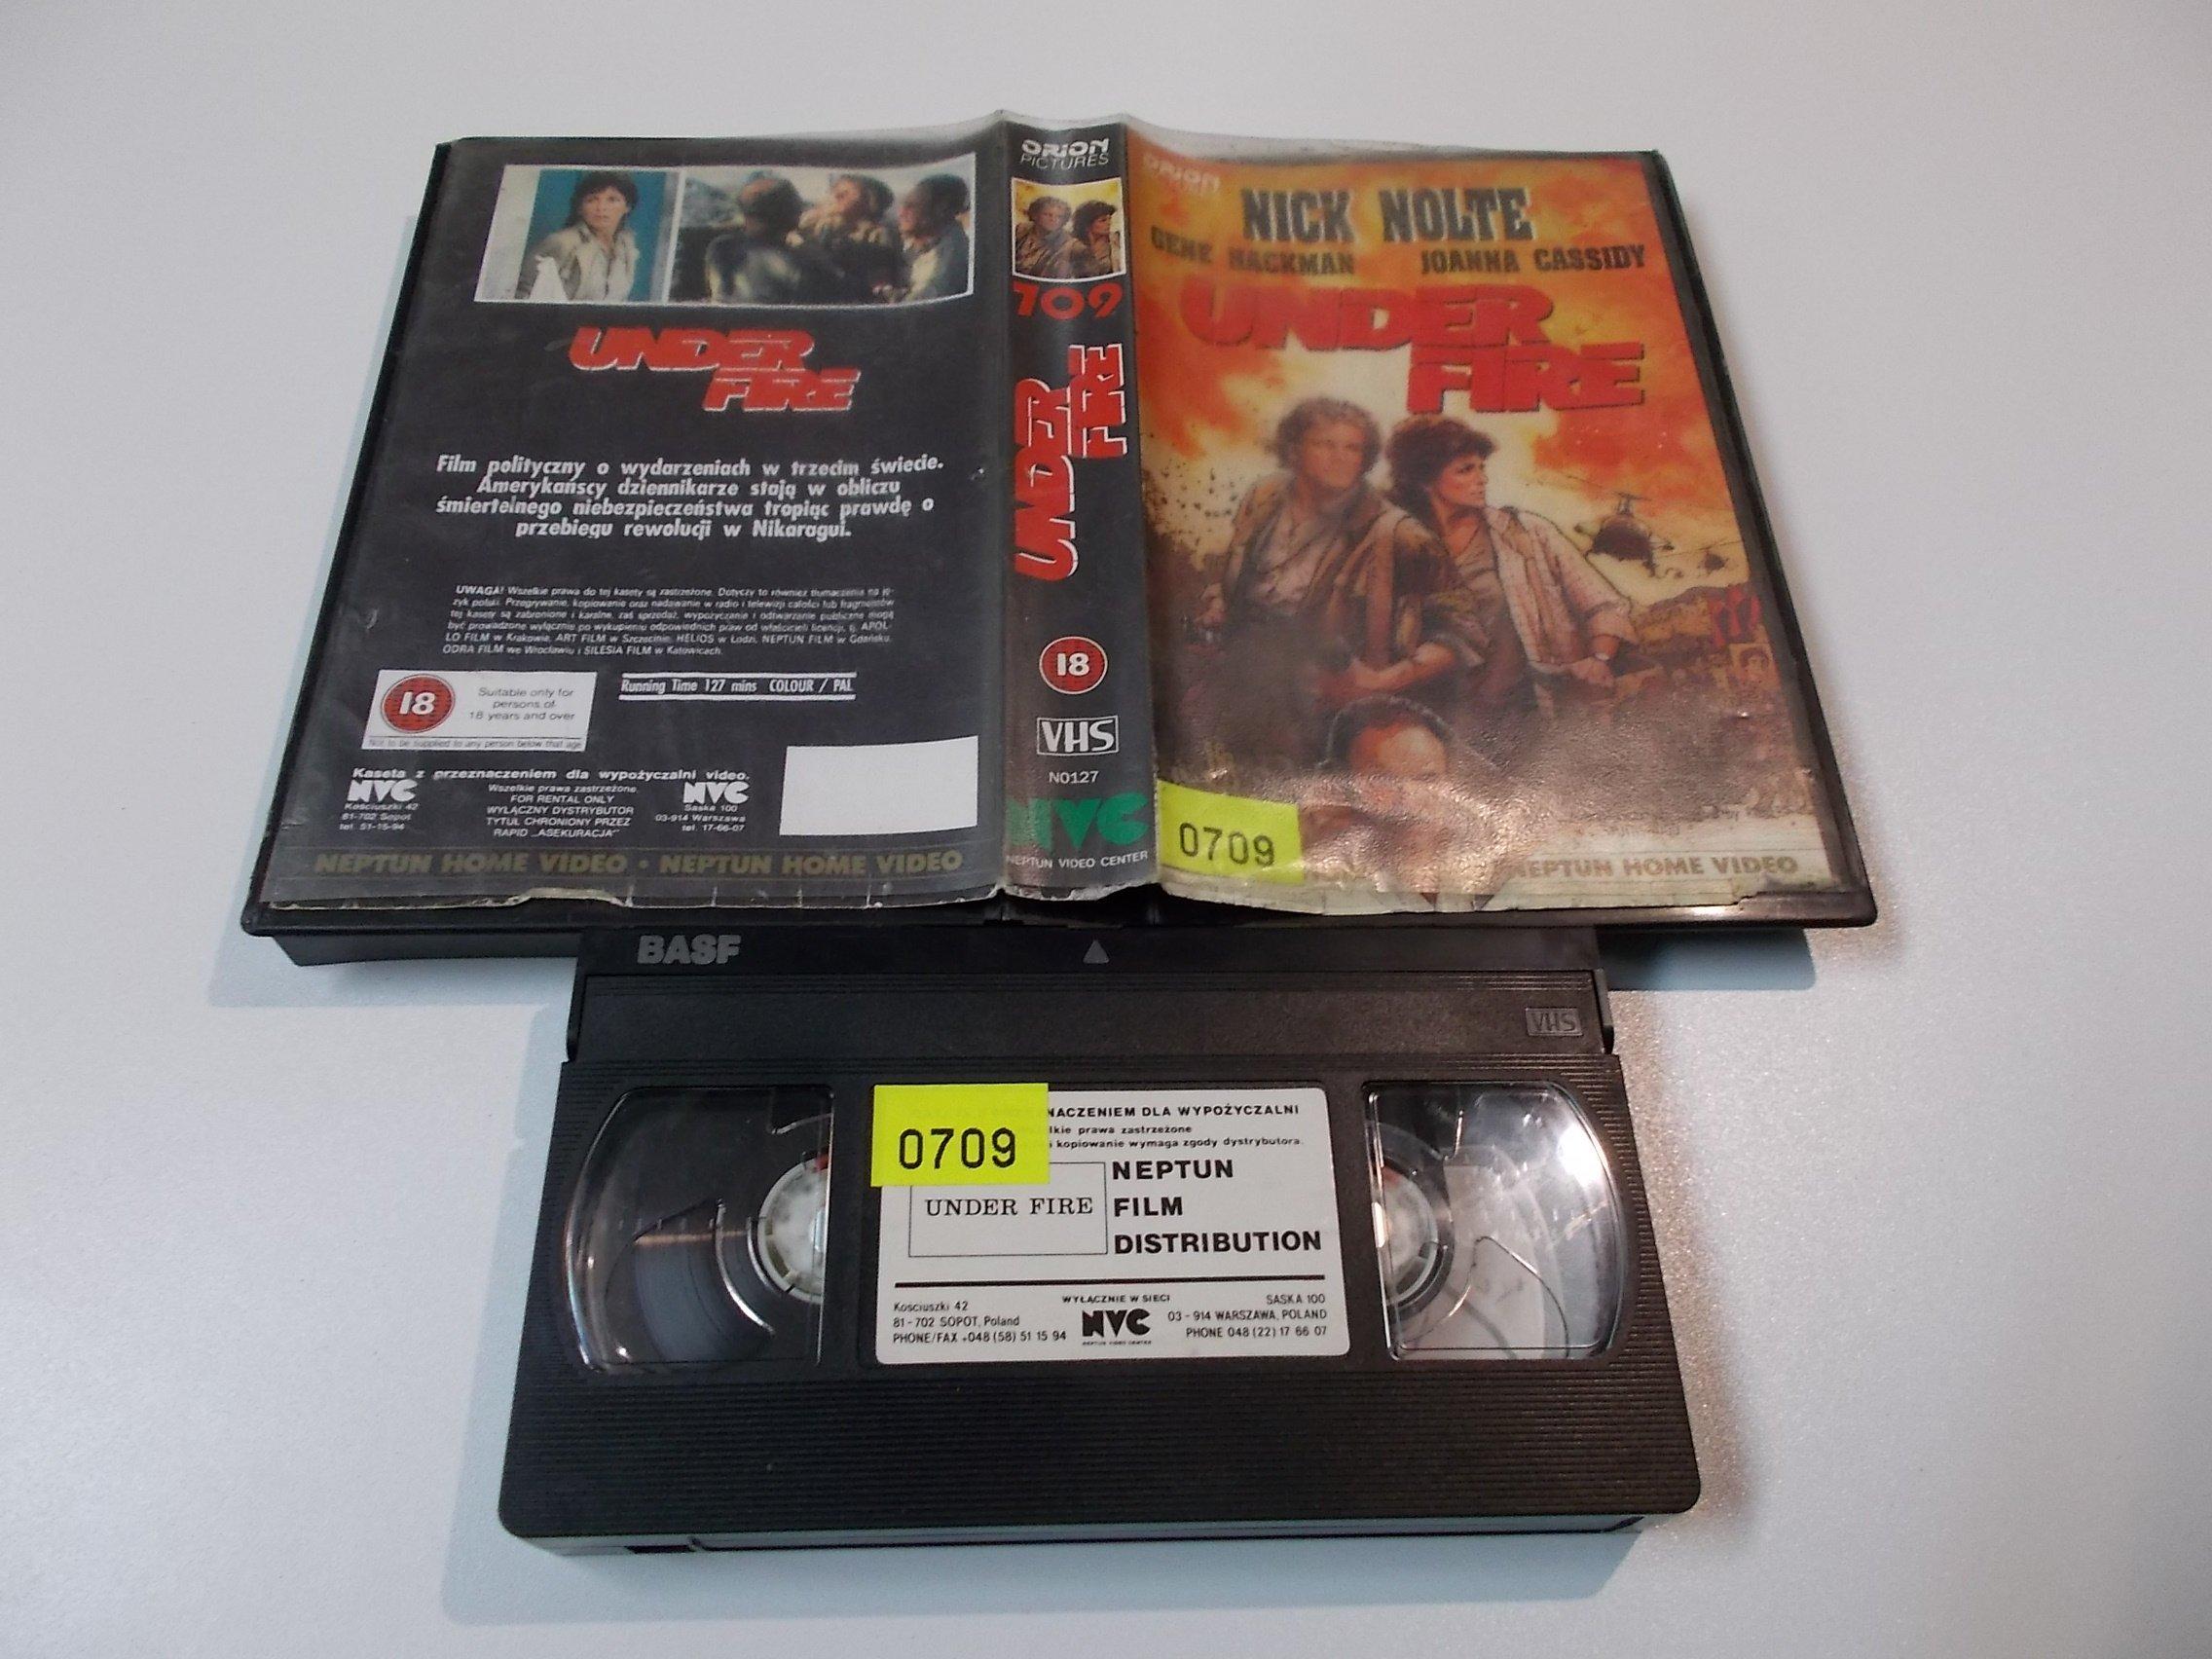 UNDER FIRE - NICK NOLTE - kaseta Video VHS - 1454 Sklep